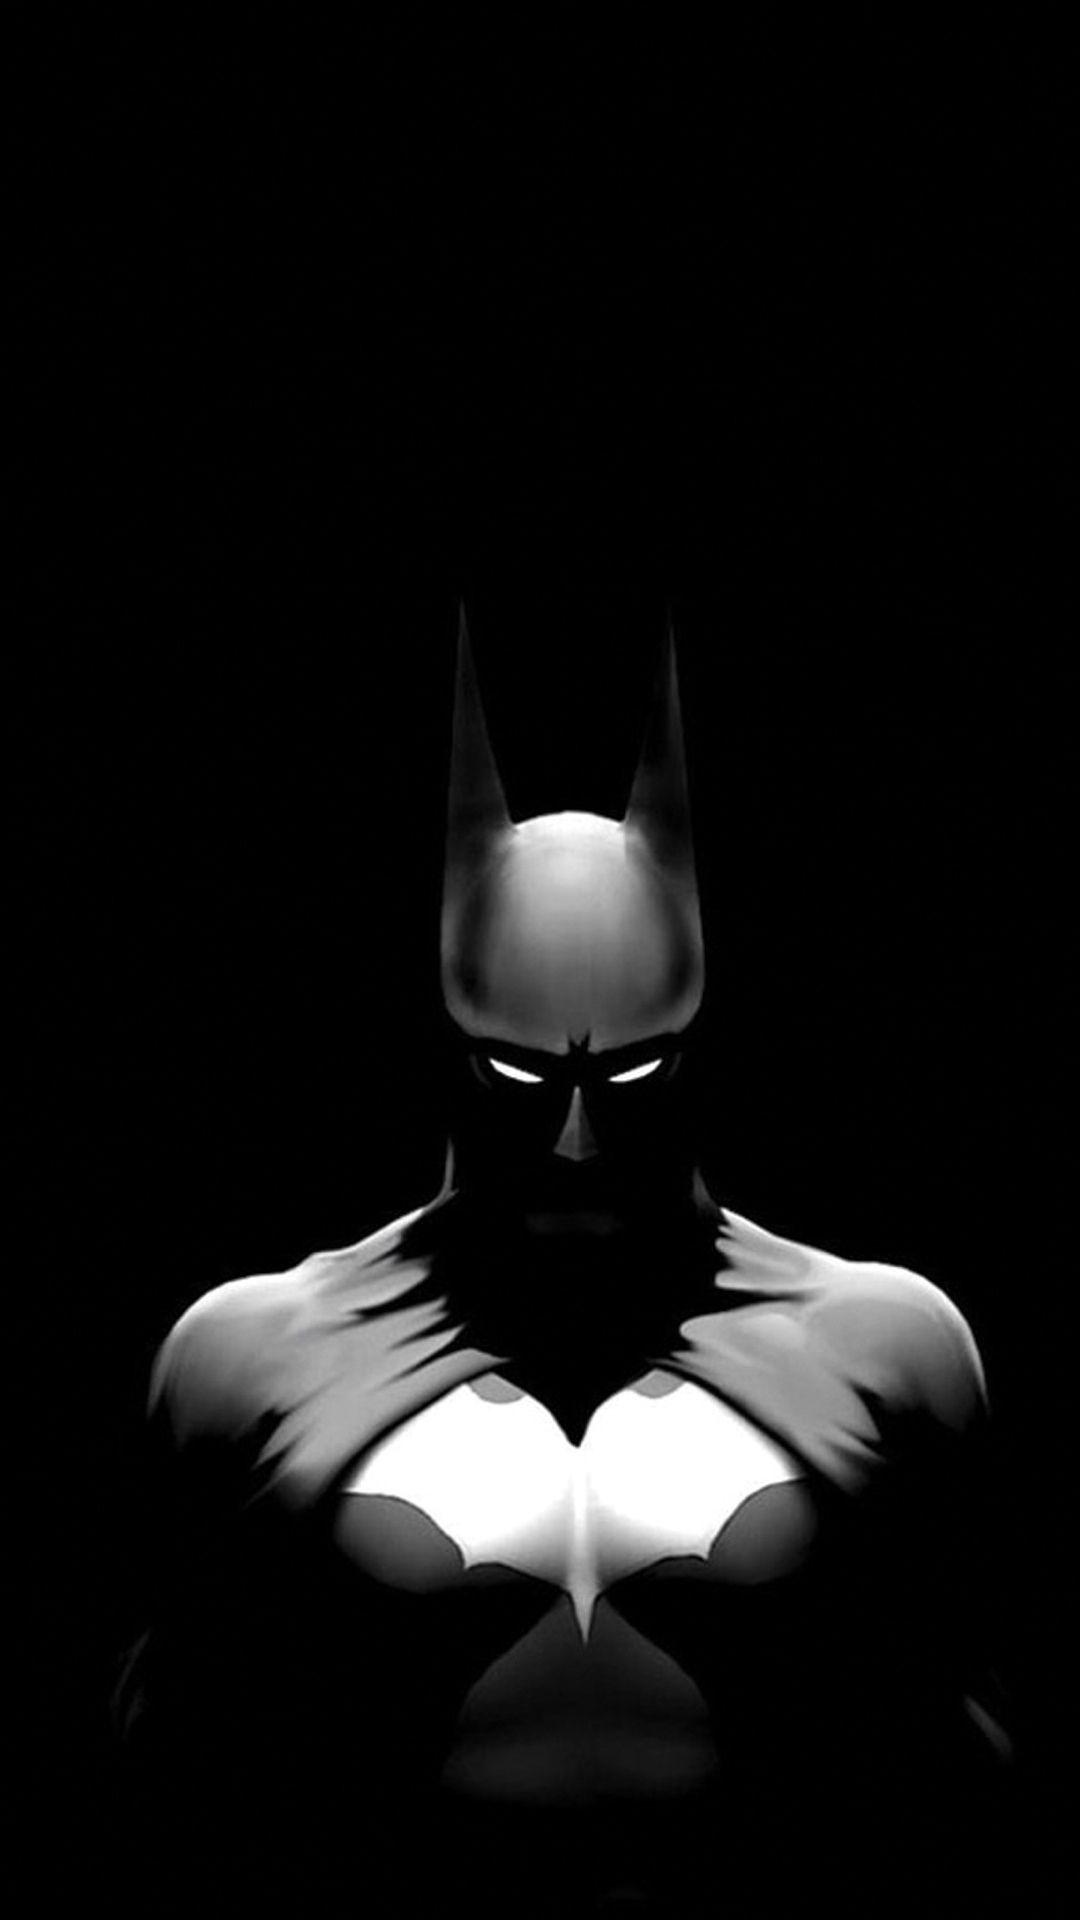 batman walls | wallpapers | pinterest | dark black wallpaper